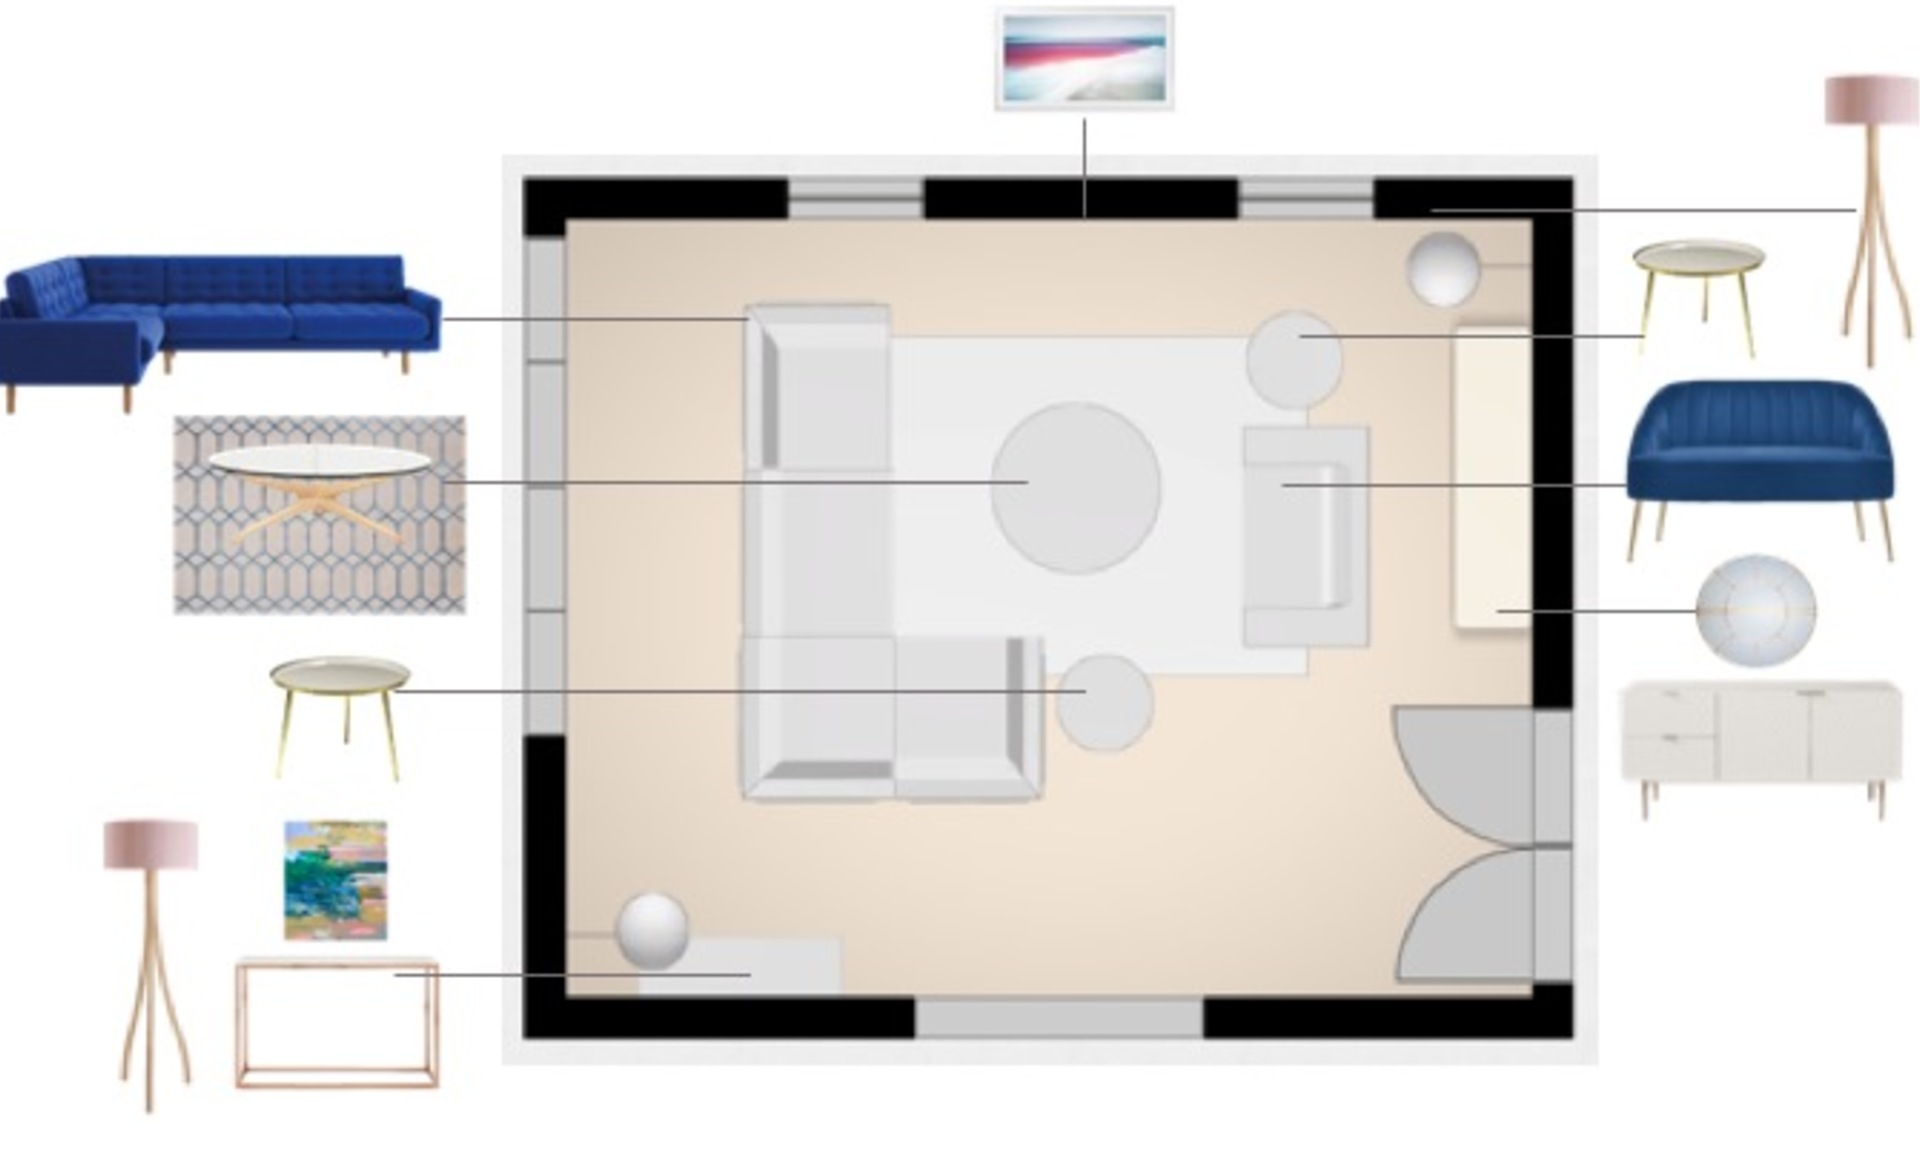 Mbr carol handa livingroom floorplan